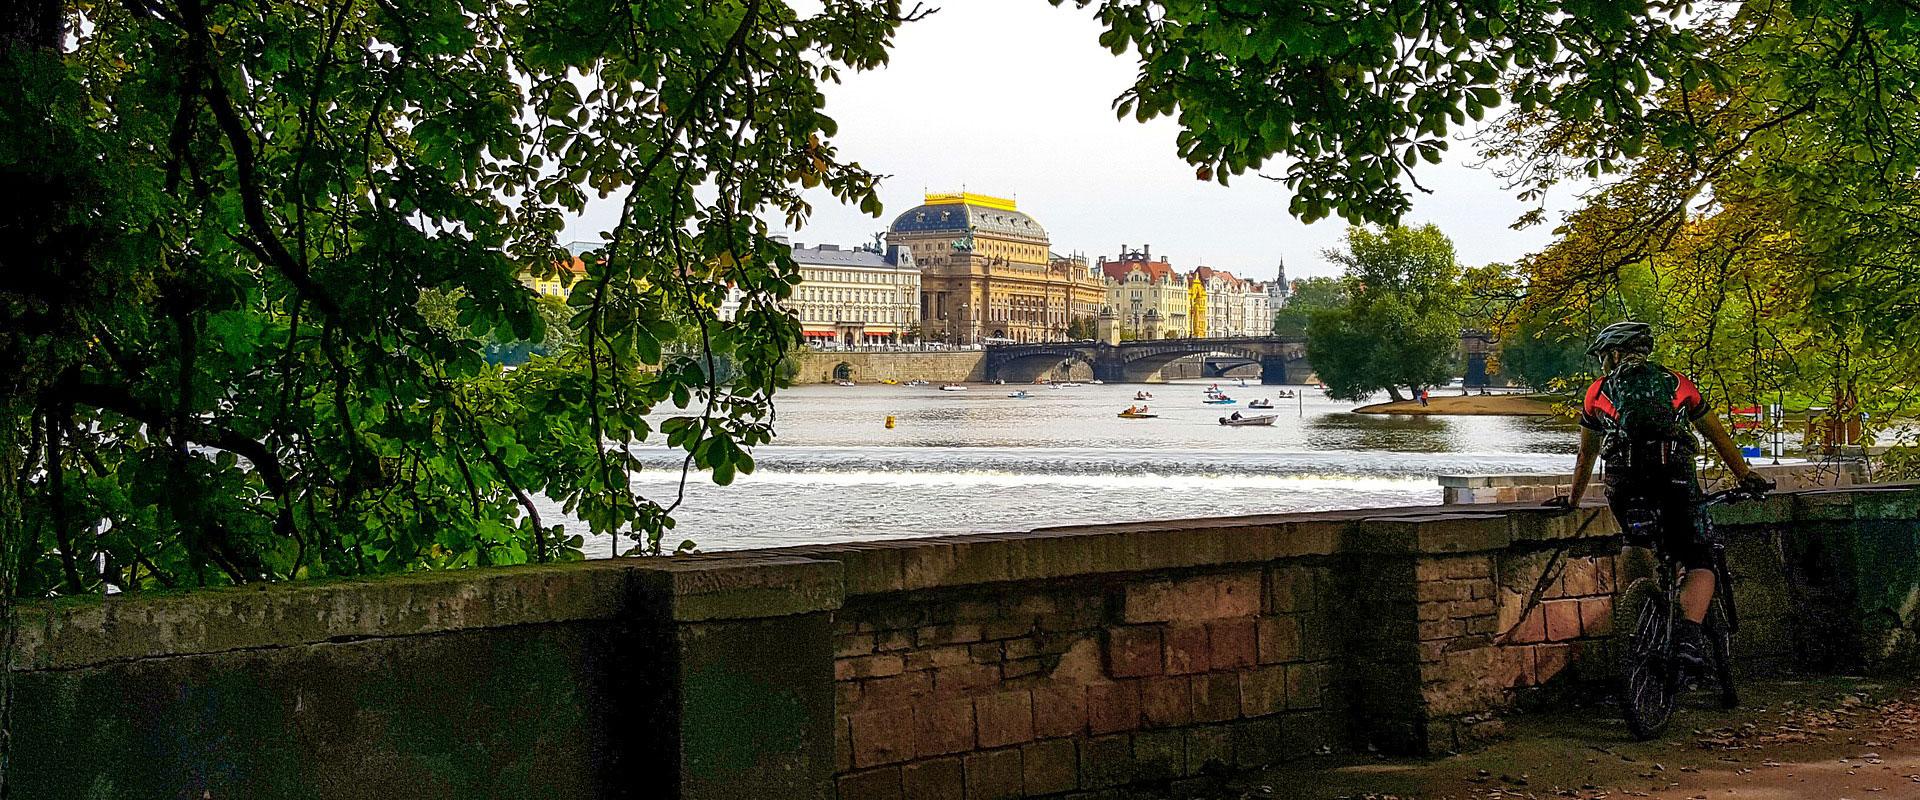 Elberadweg: Prag-Dresden